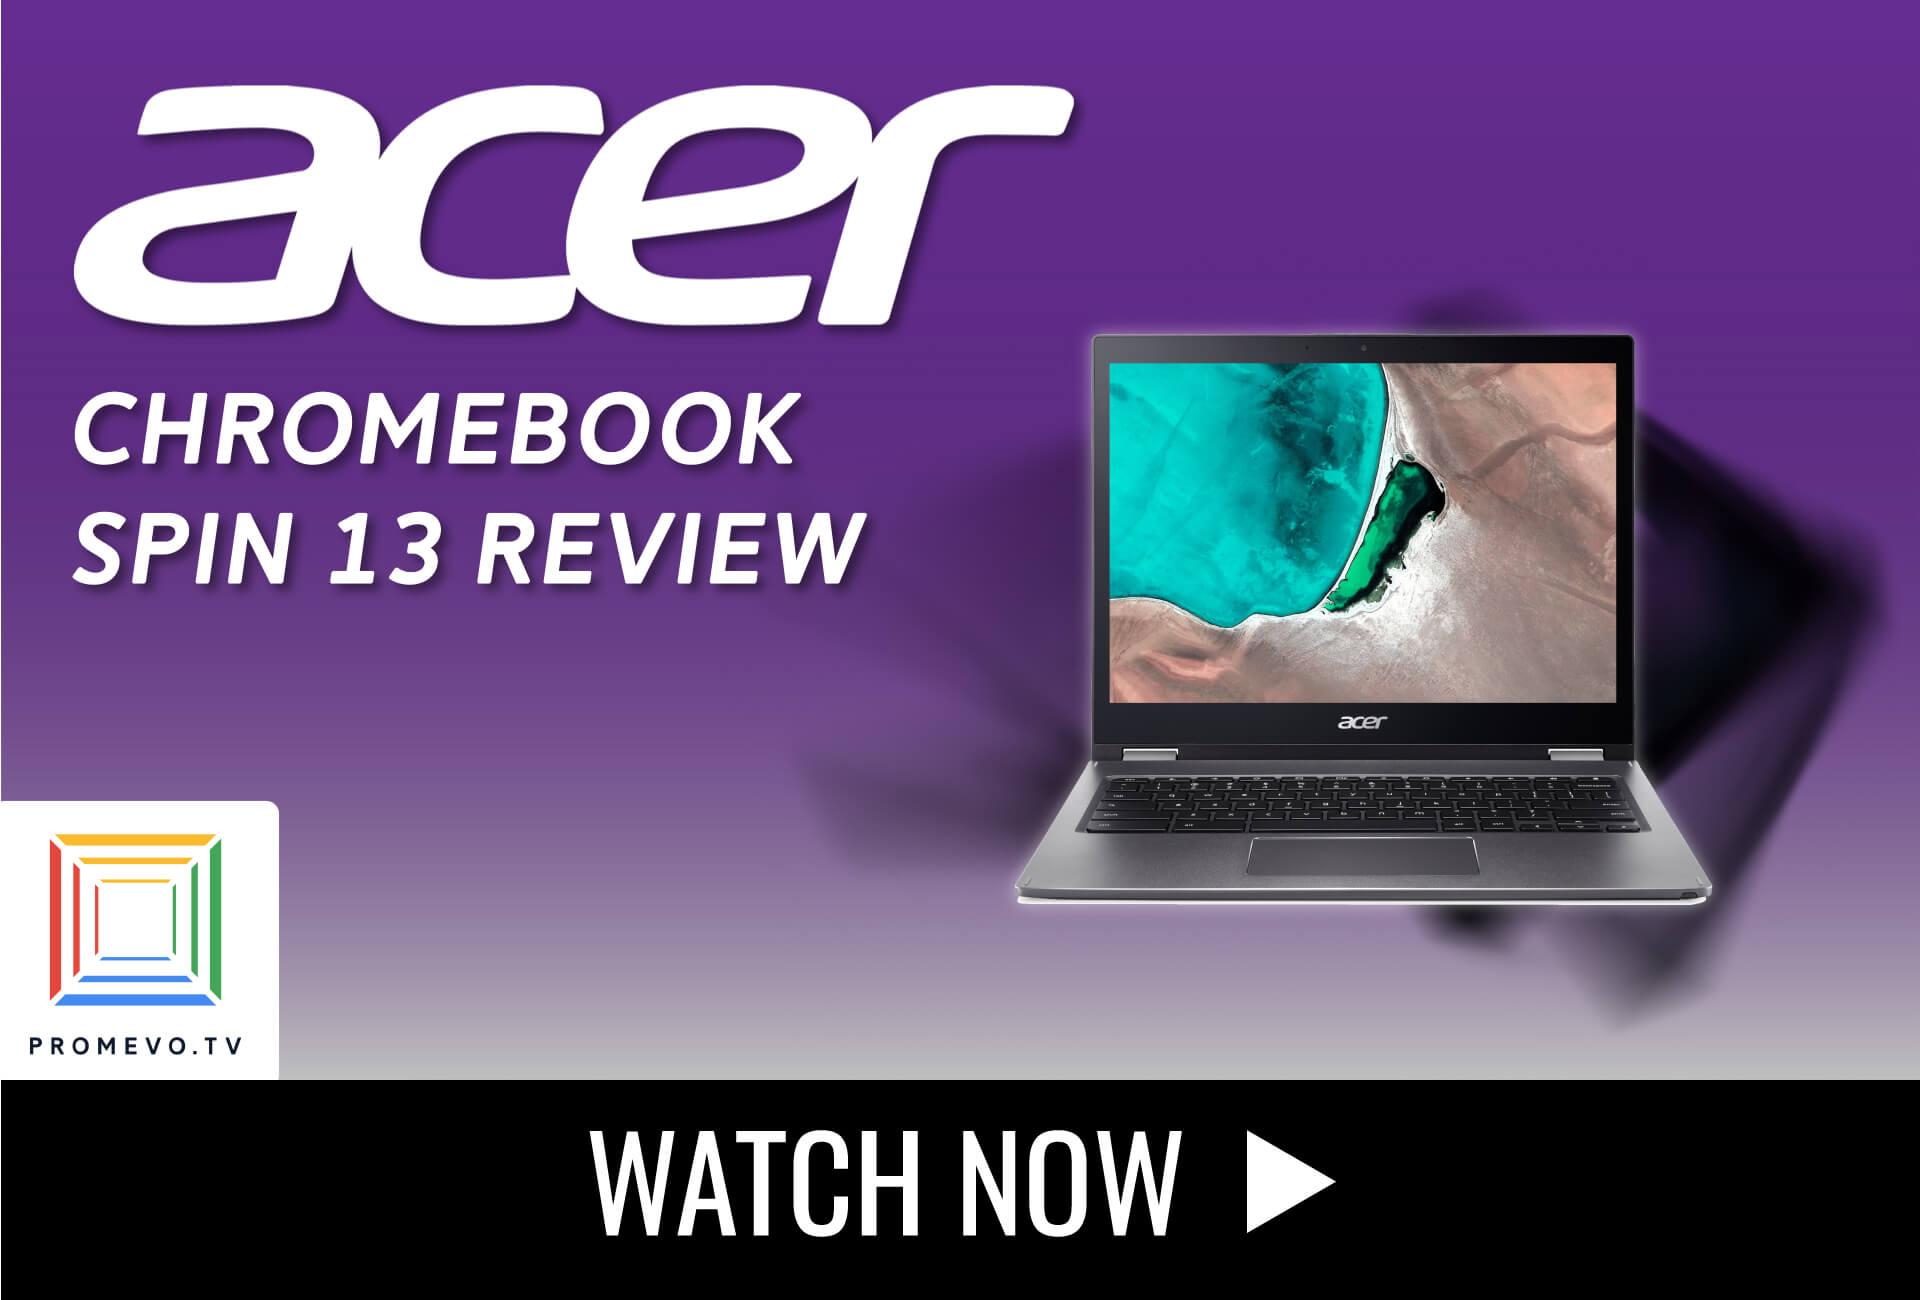 Promevo.TV Reviews: Acer Spin 13 Chromebook